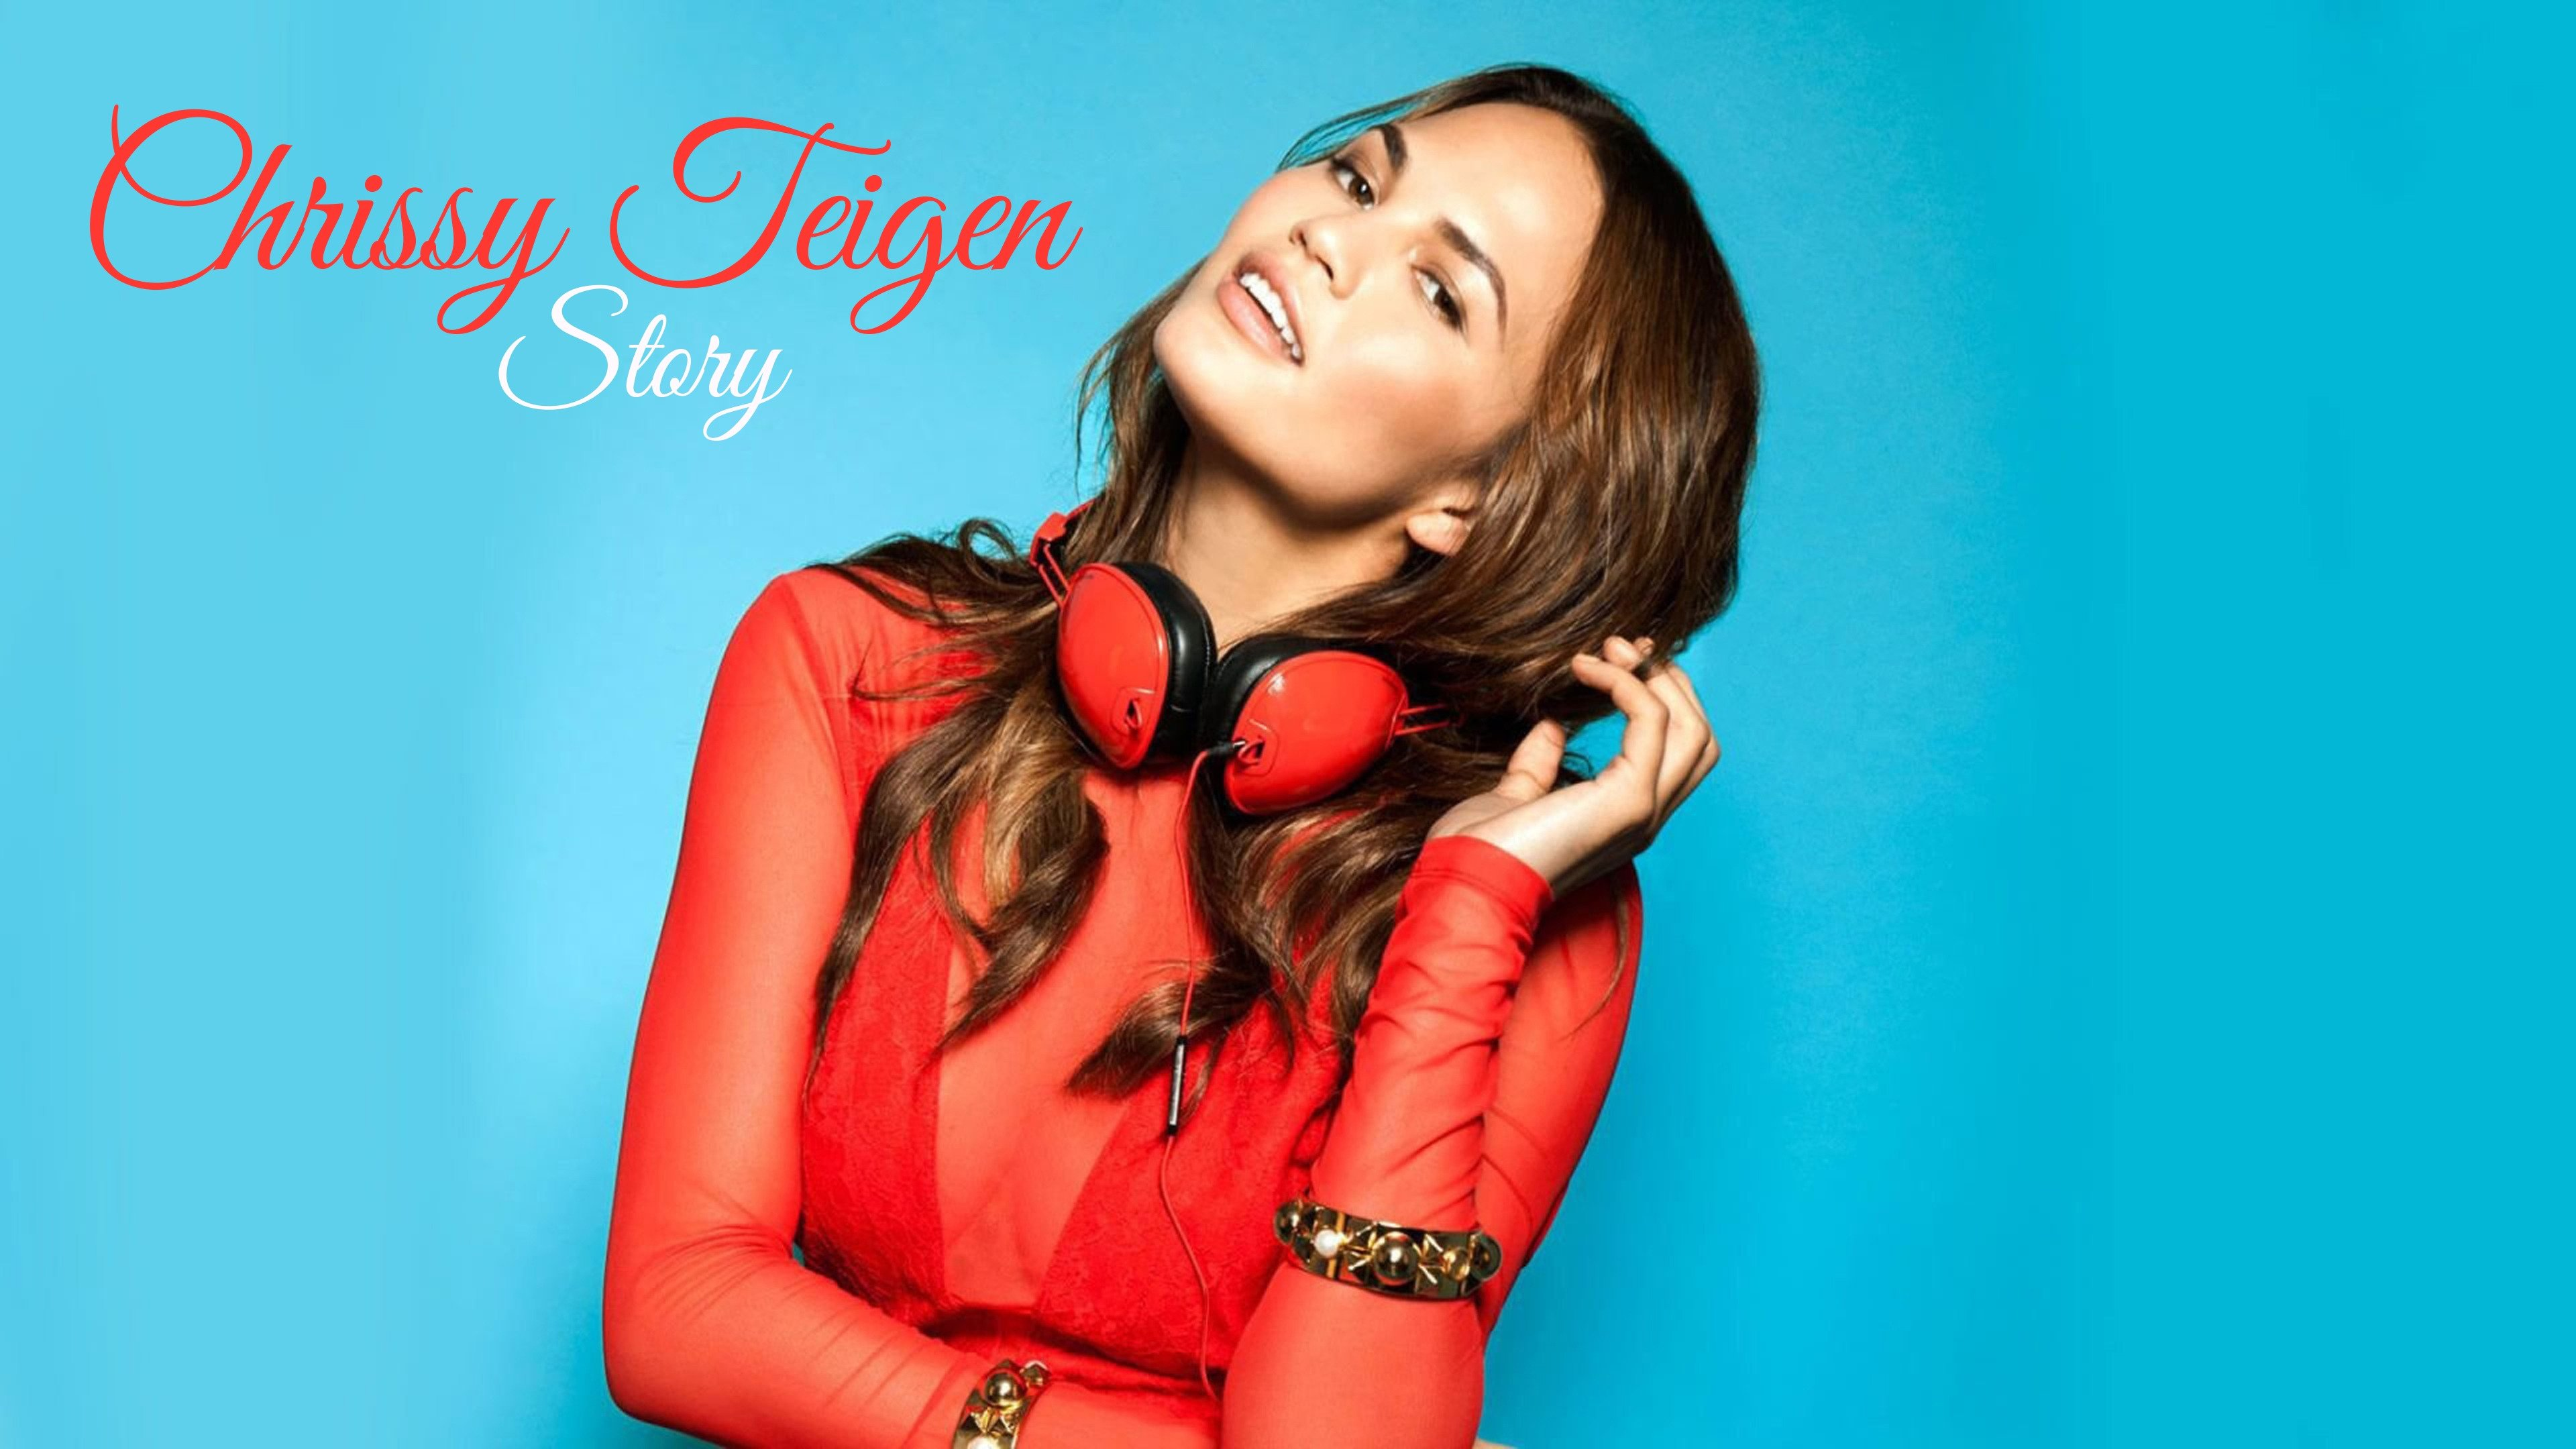 Chrissy Teigen Story